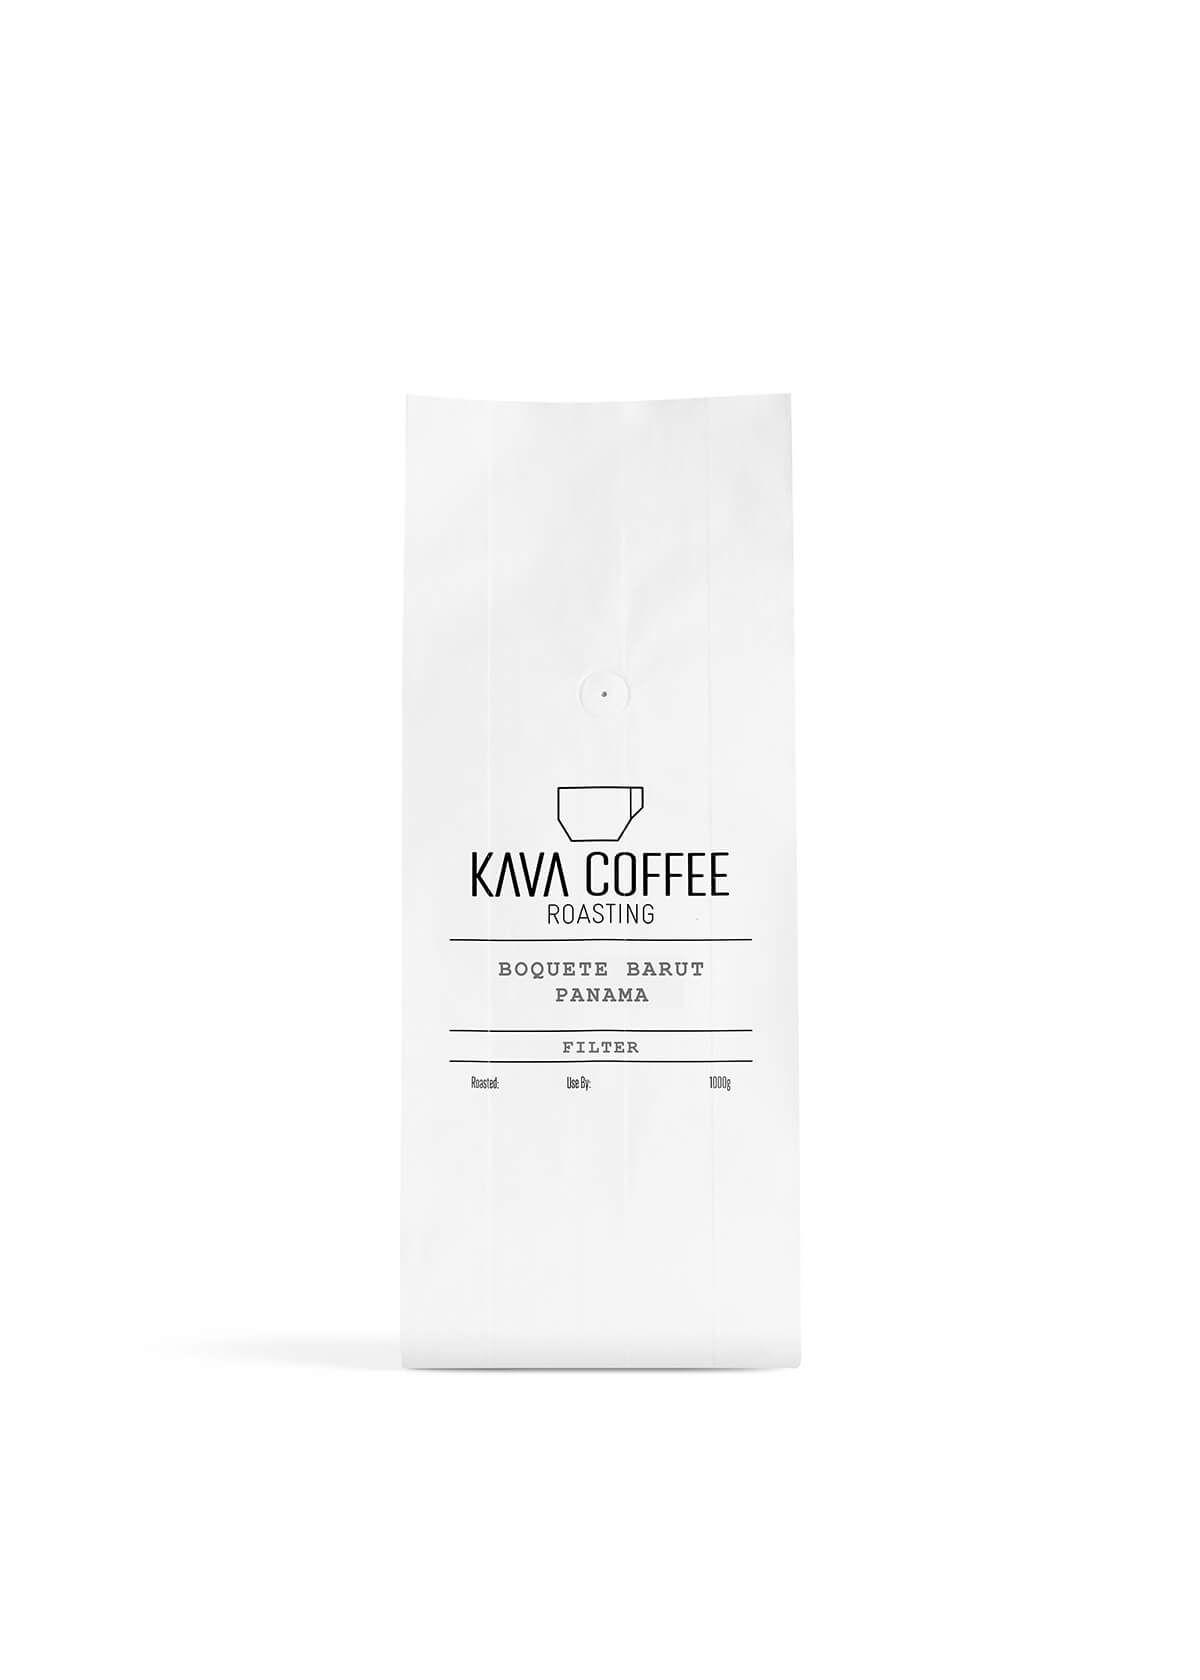 Ayın Kahvesi - Panama Boquete Barut Filtre Kahve 1 kg.